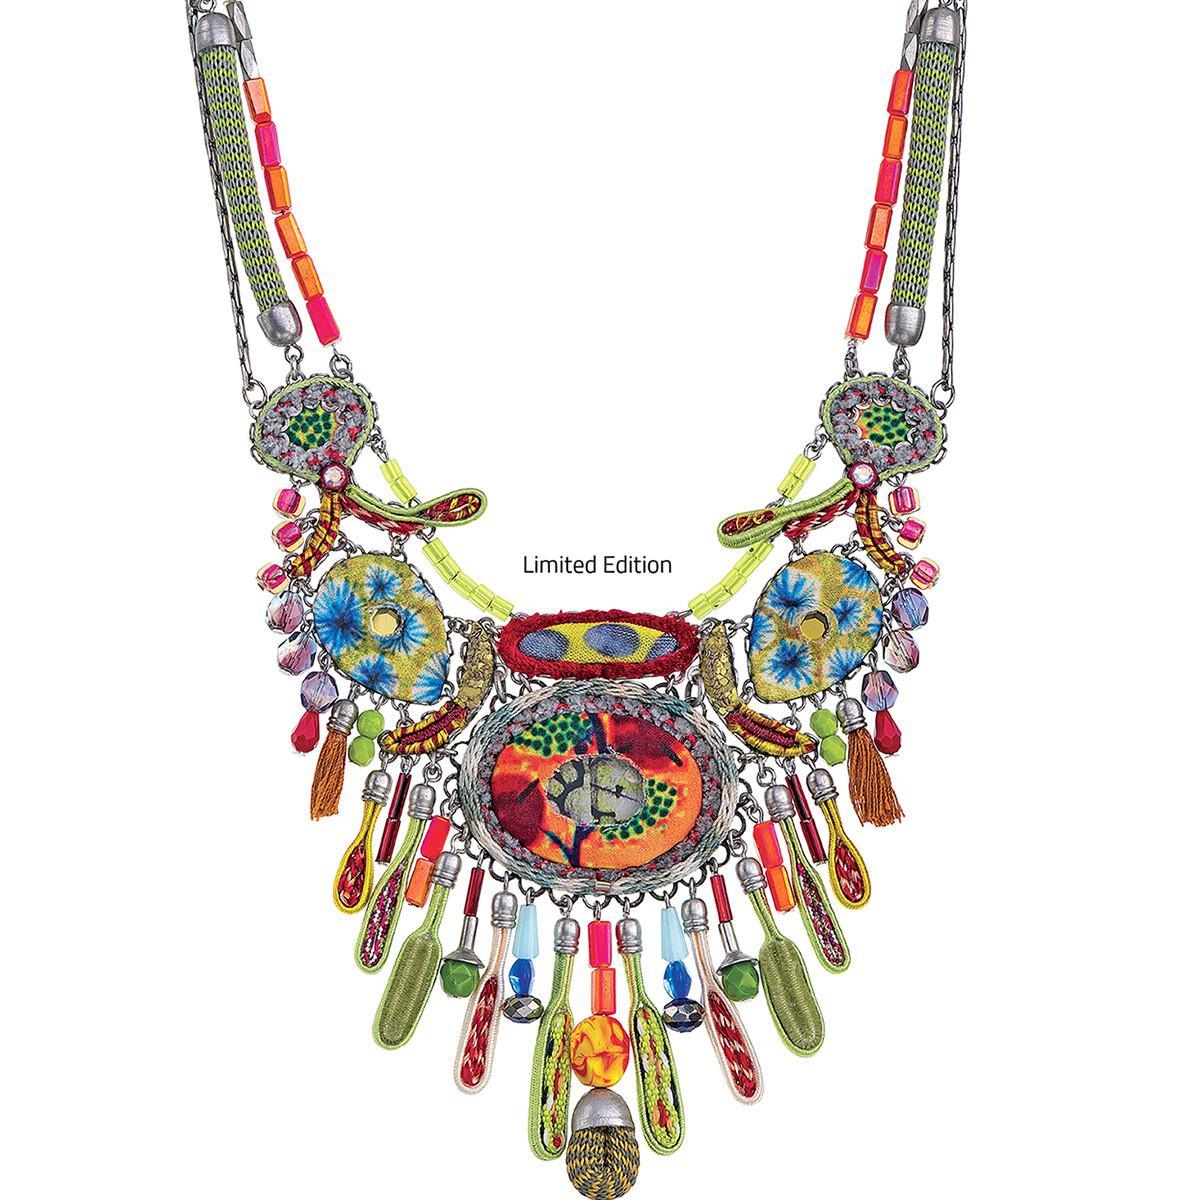 Ayala Bar Havana Limited Edition Necklace